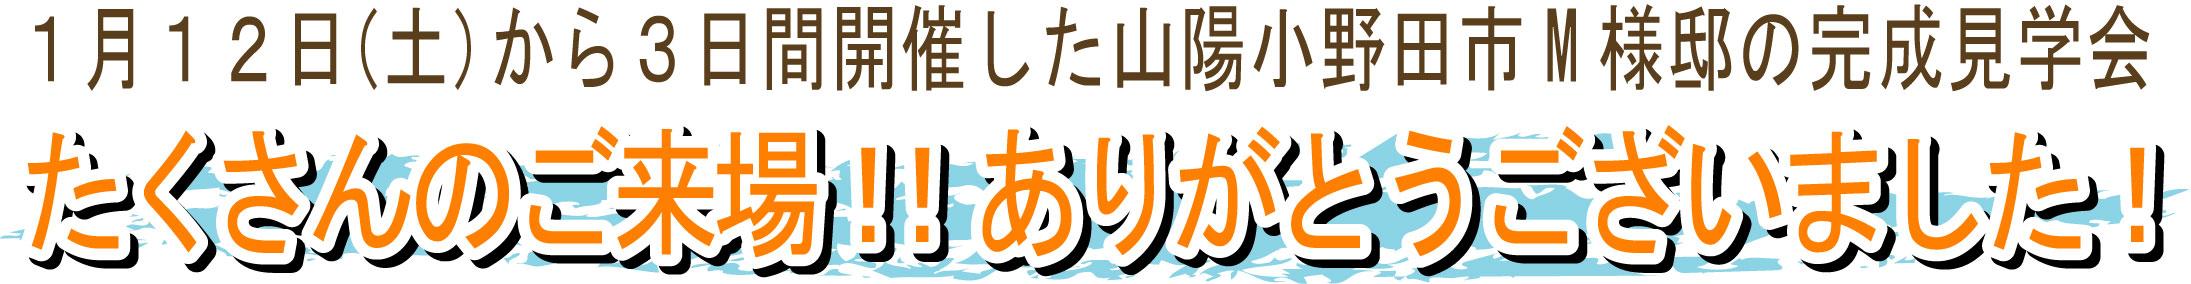 KuraSi-natu-sin68-03.jpg